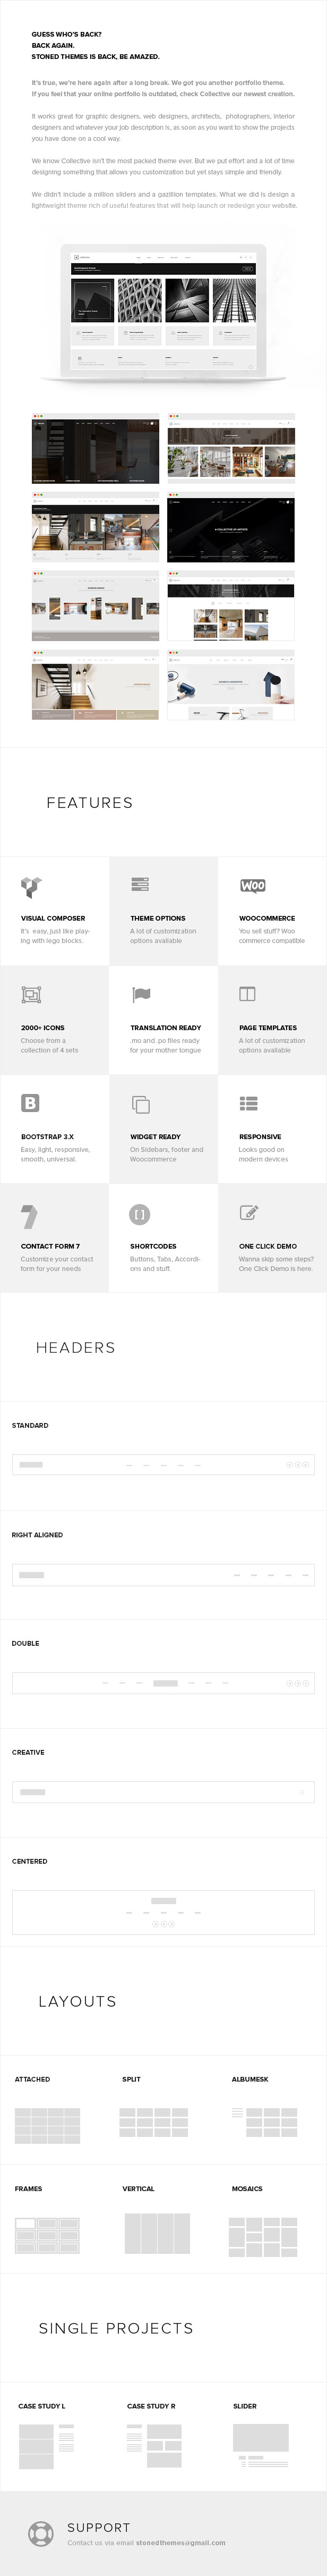 Collective - Minimal WordPress Theme - 1